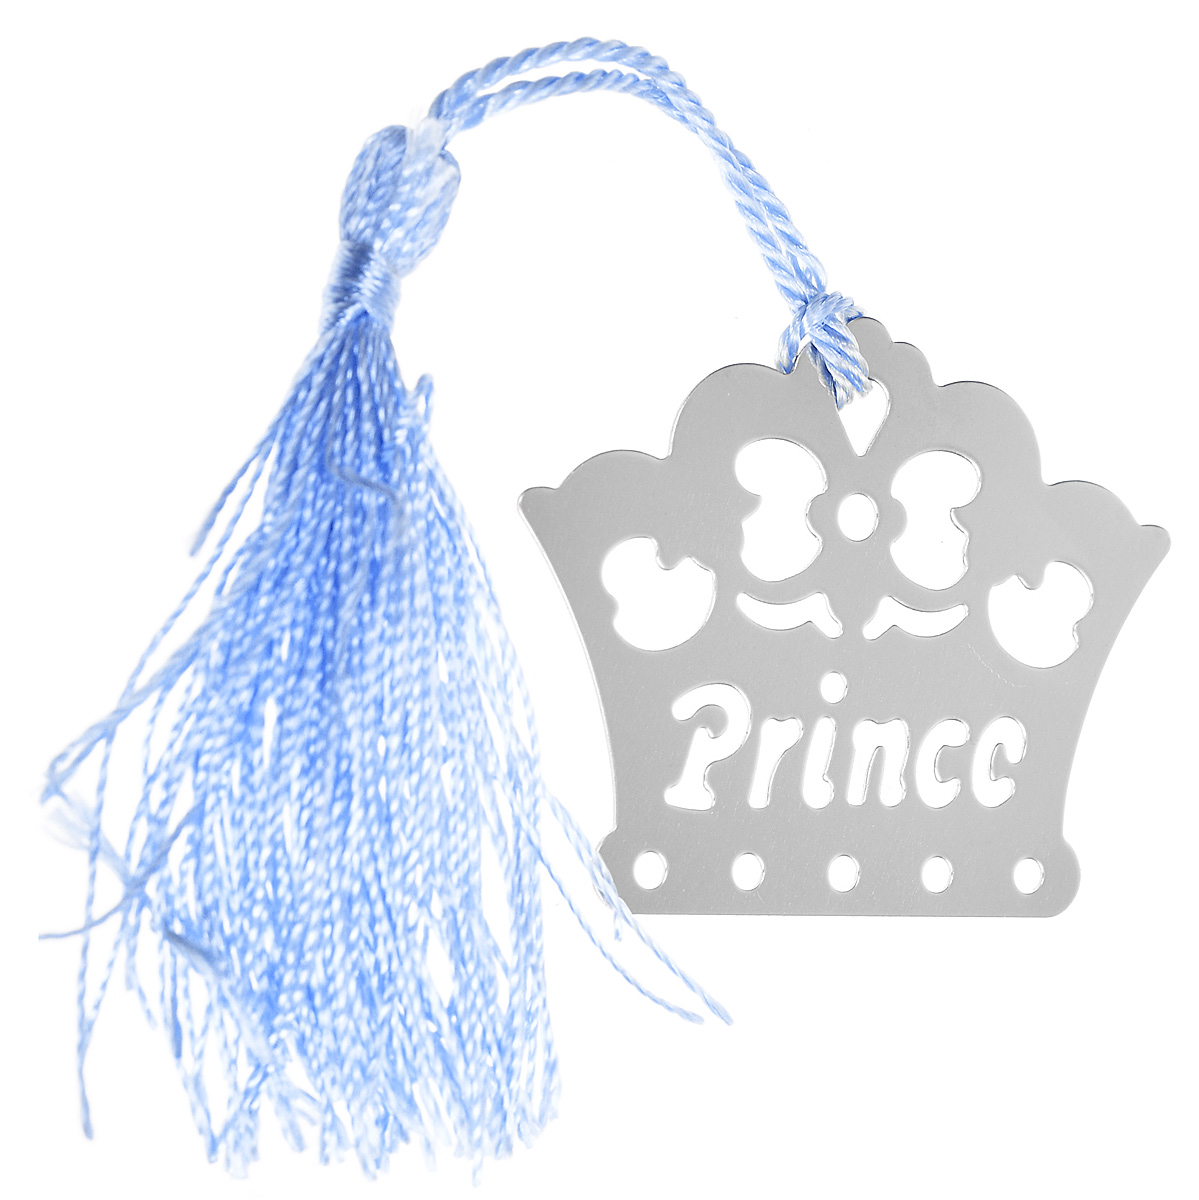 Magic Home Закладка для книг Корона Принц magic home закладка для книг 75700